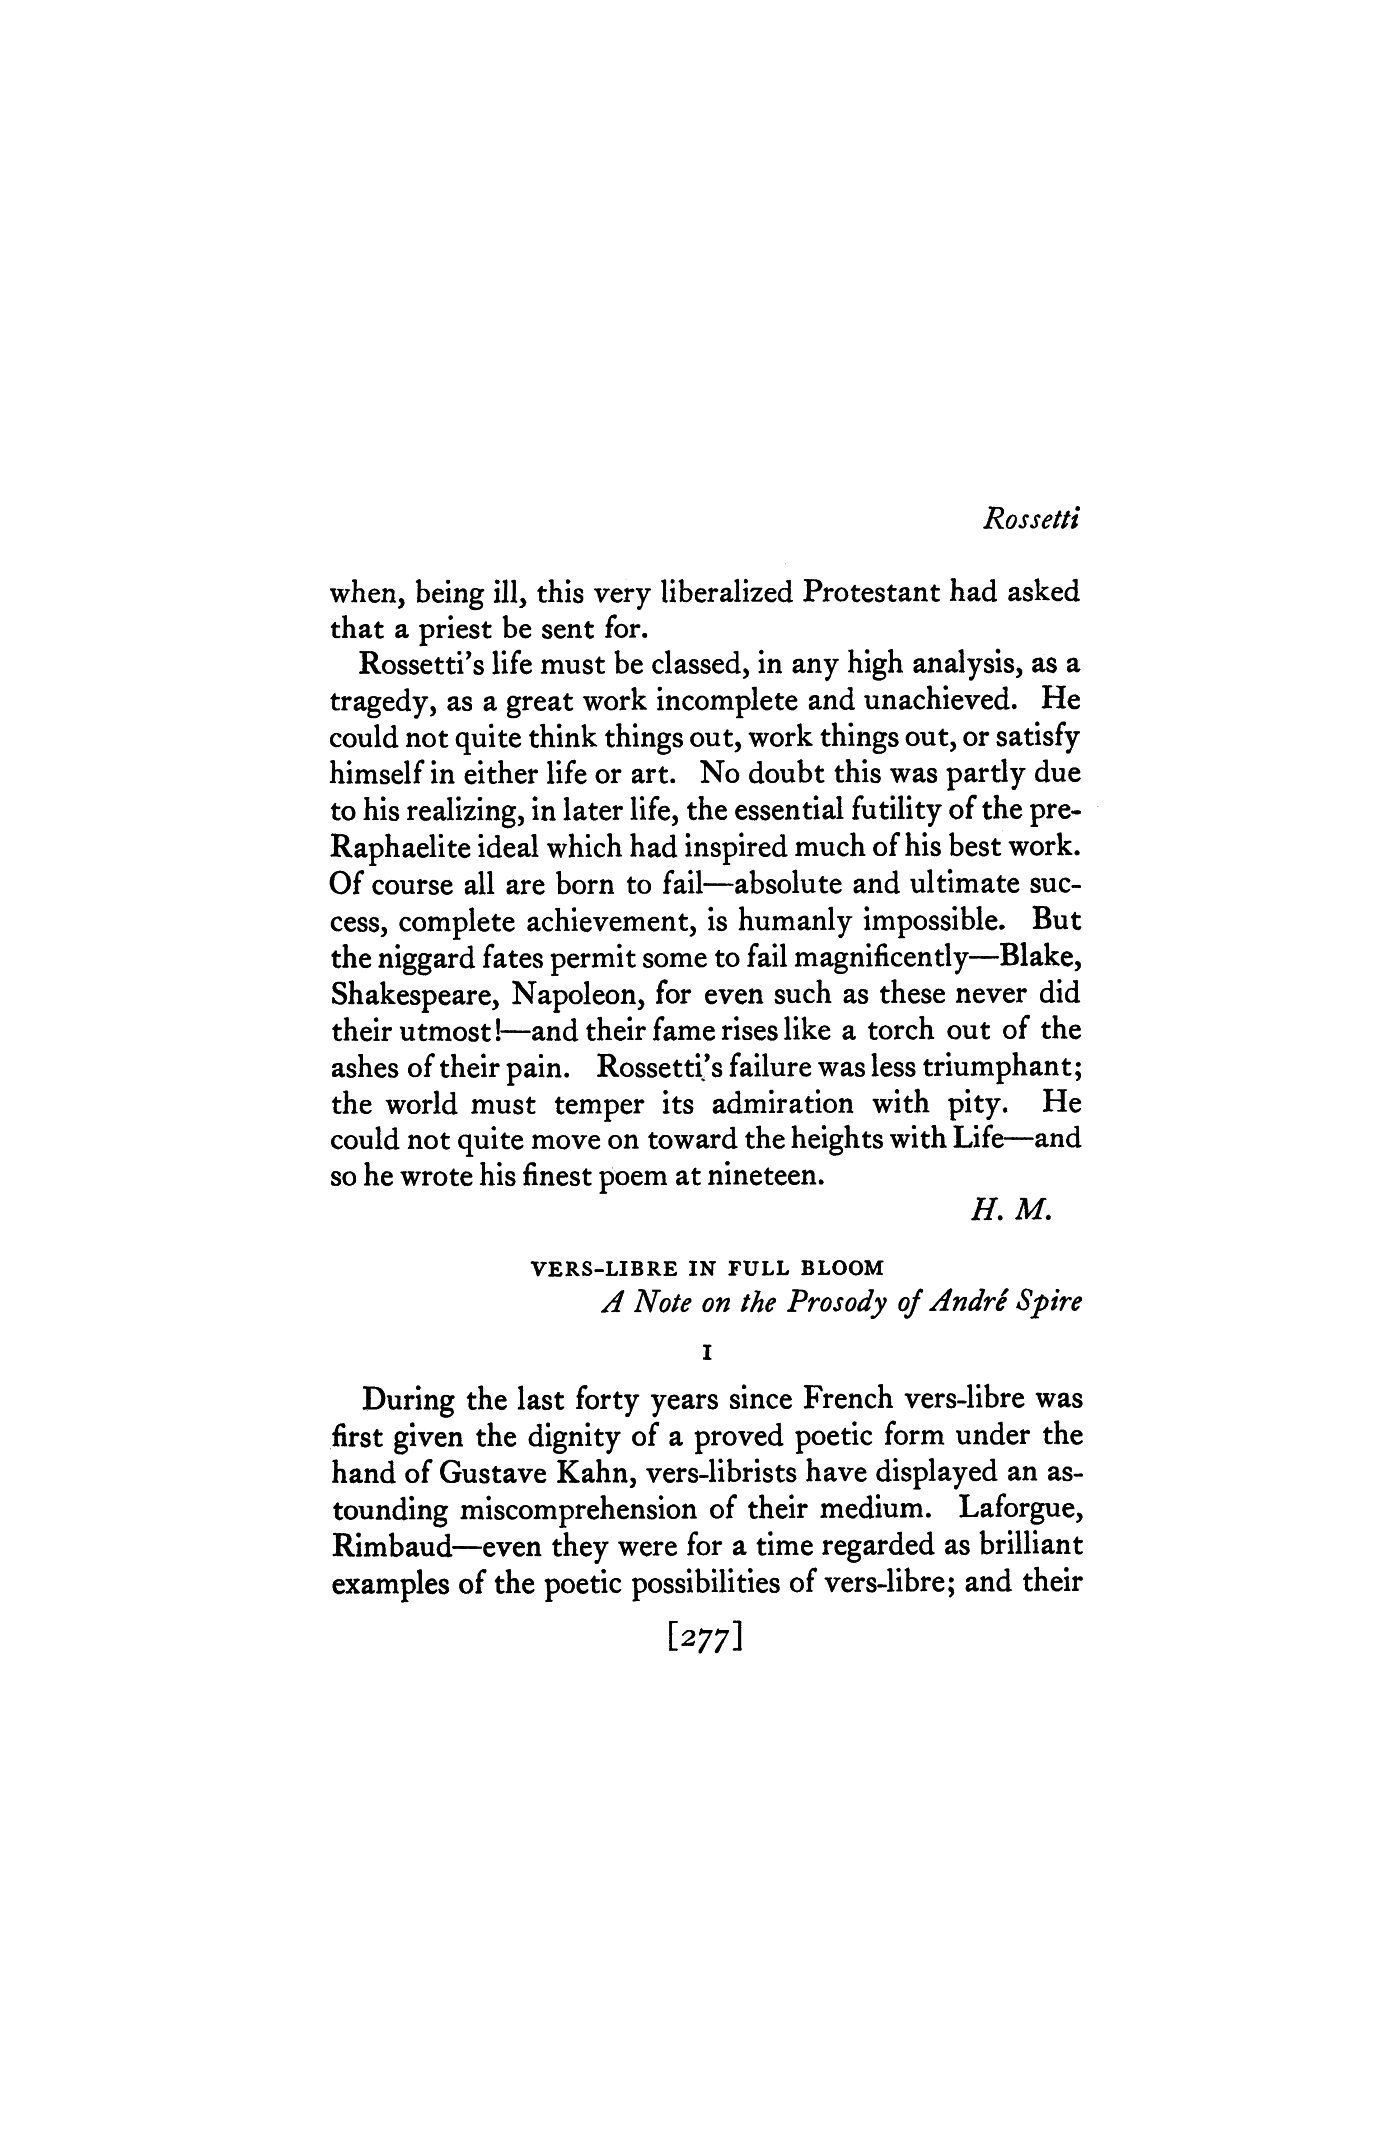 Vers-Libre in Full Bloom by Stanley Burnshaw | Rossetti by Harriet ...